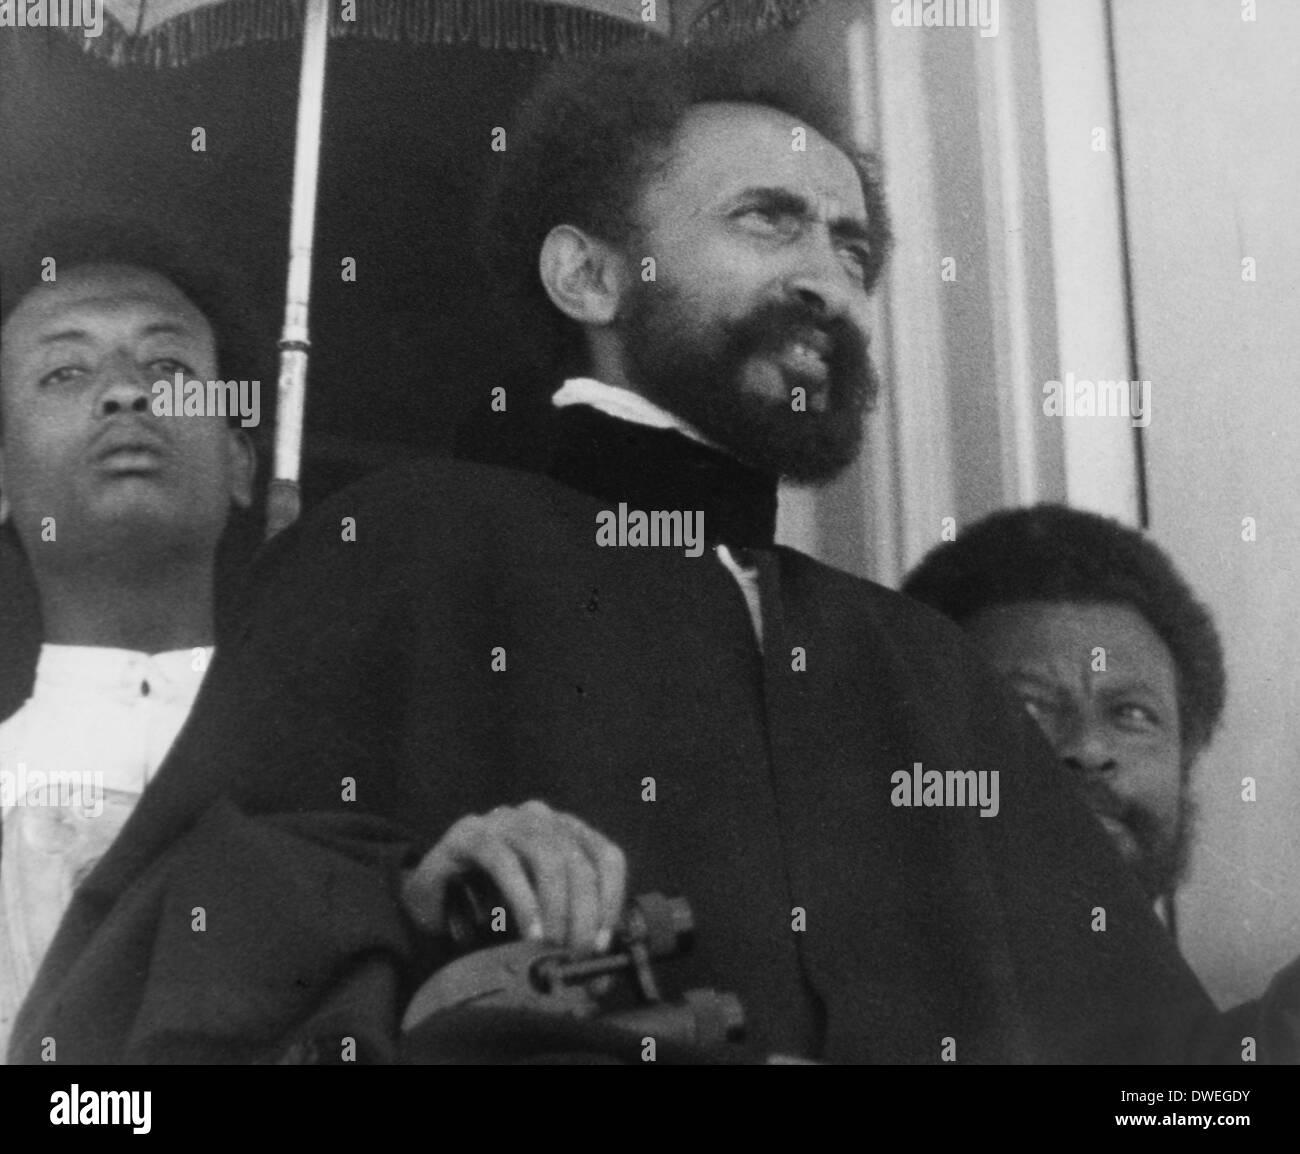 Haile Selassie (1892-1975), Emperor of Ethiopia, Portrait, 1935 - Stock Image